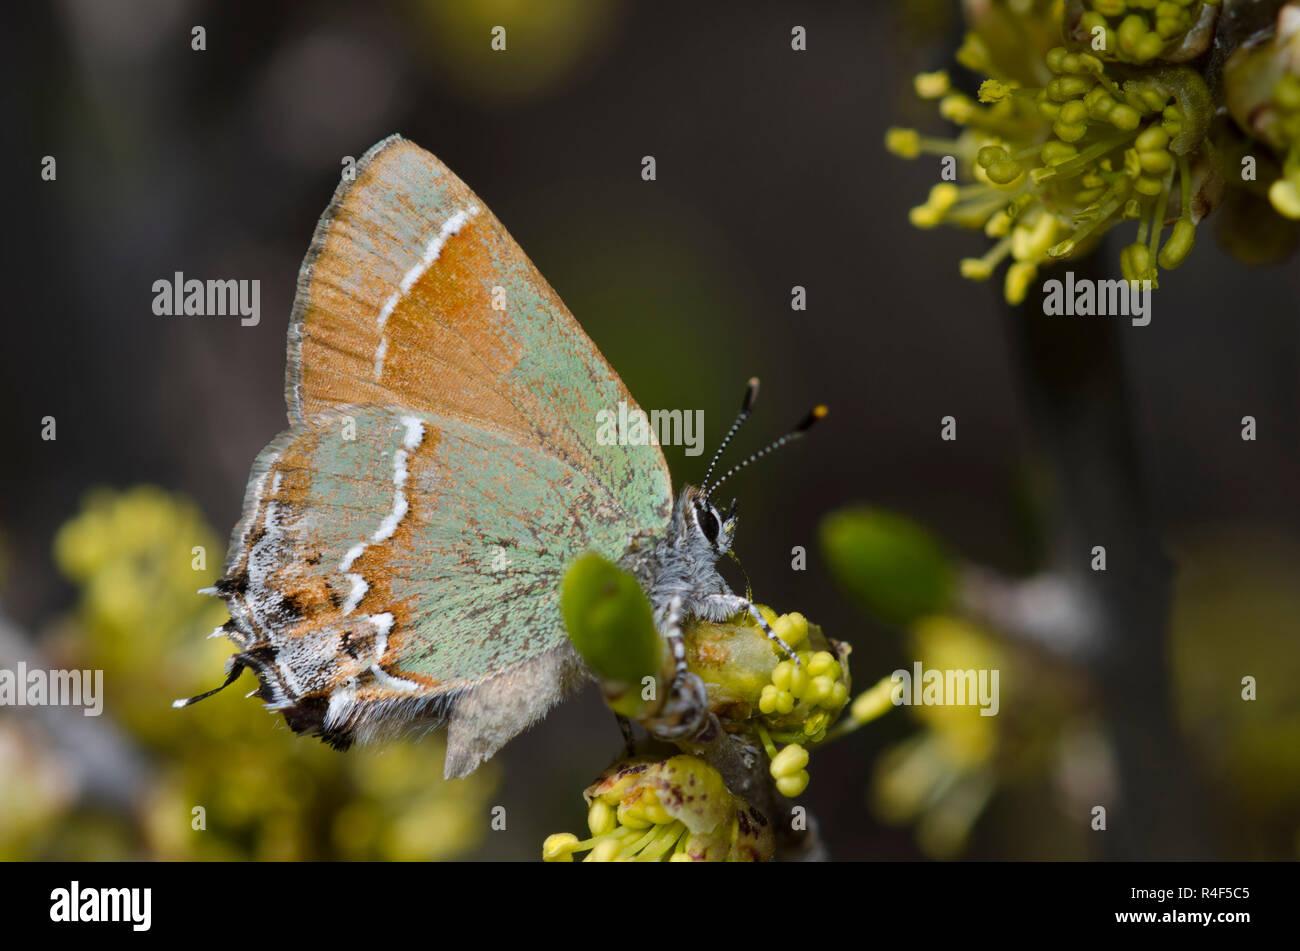 Juniper Hairstreak, Callophrys gryneus, nectaring de New Mexico Olive, Forestiera pubescens Foto de stock